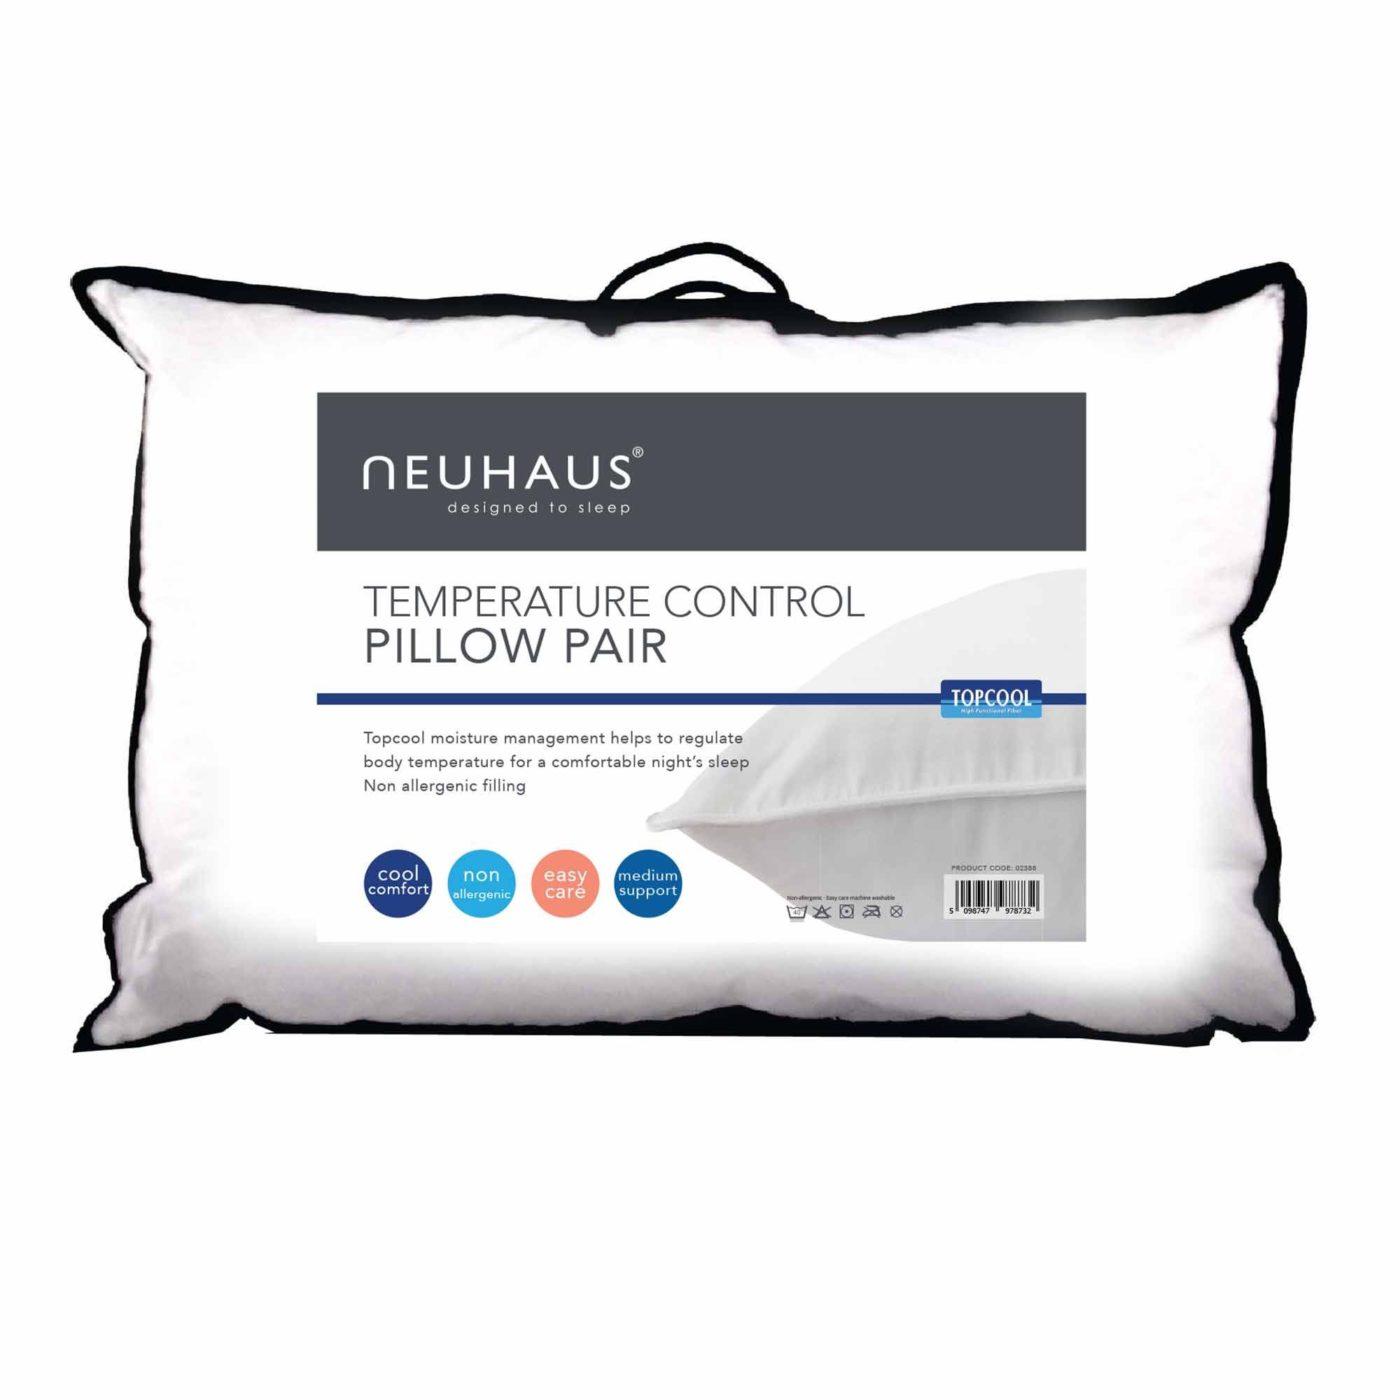 Neuhaus Top Cool Temperature Control Twin Pack Pillows